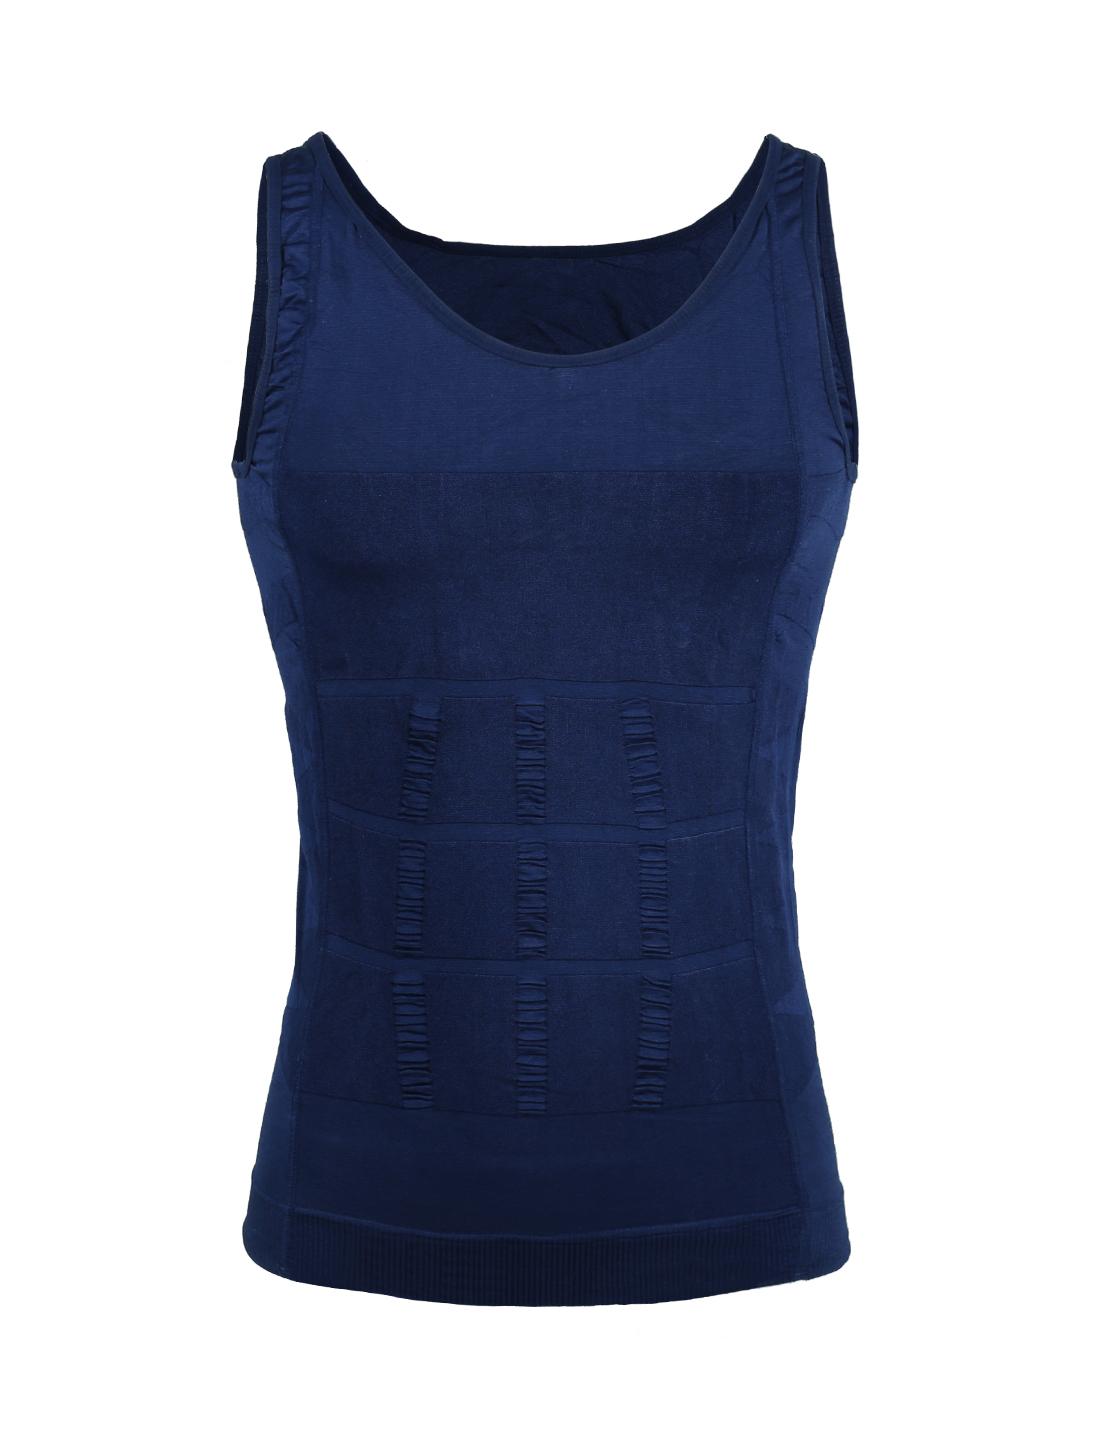 Men Compression Slimming Body Tummy Waist Shapewear Tank Top Blue Medium